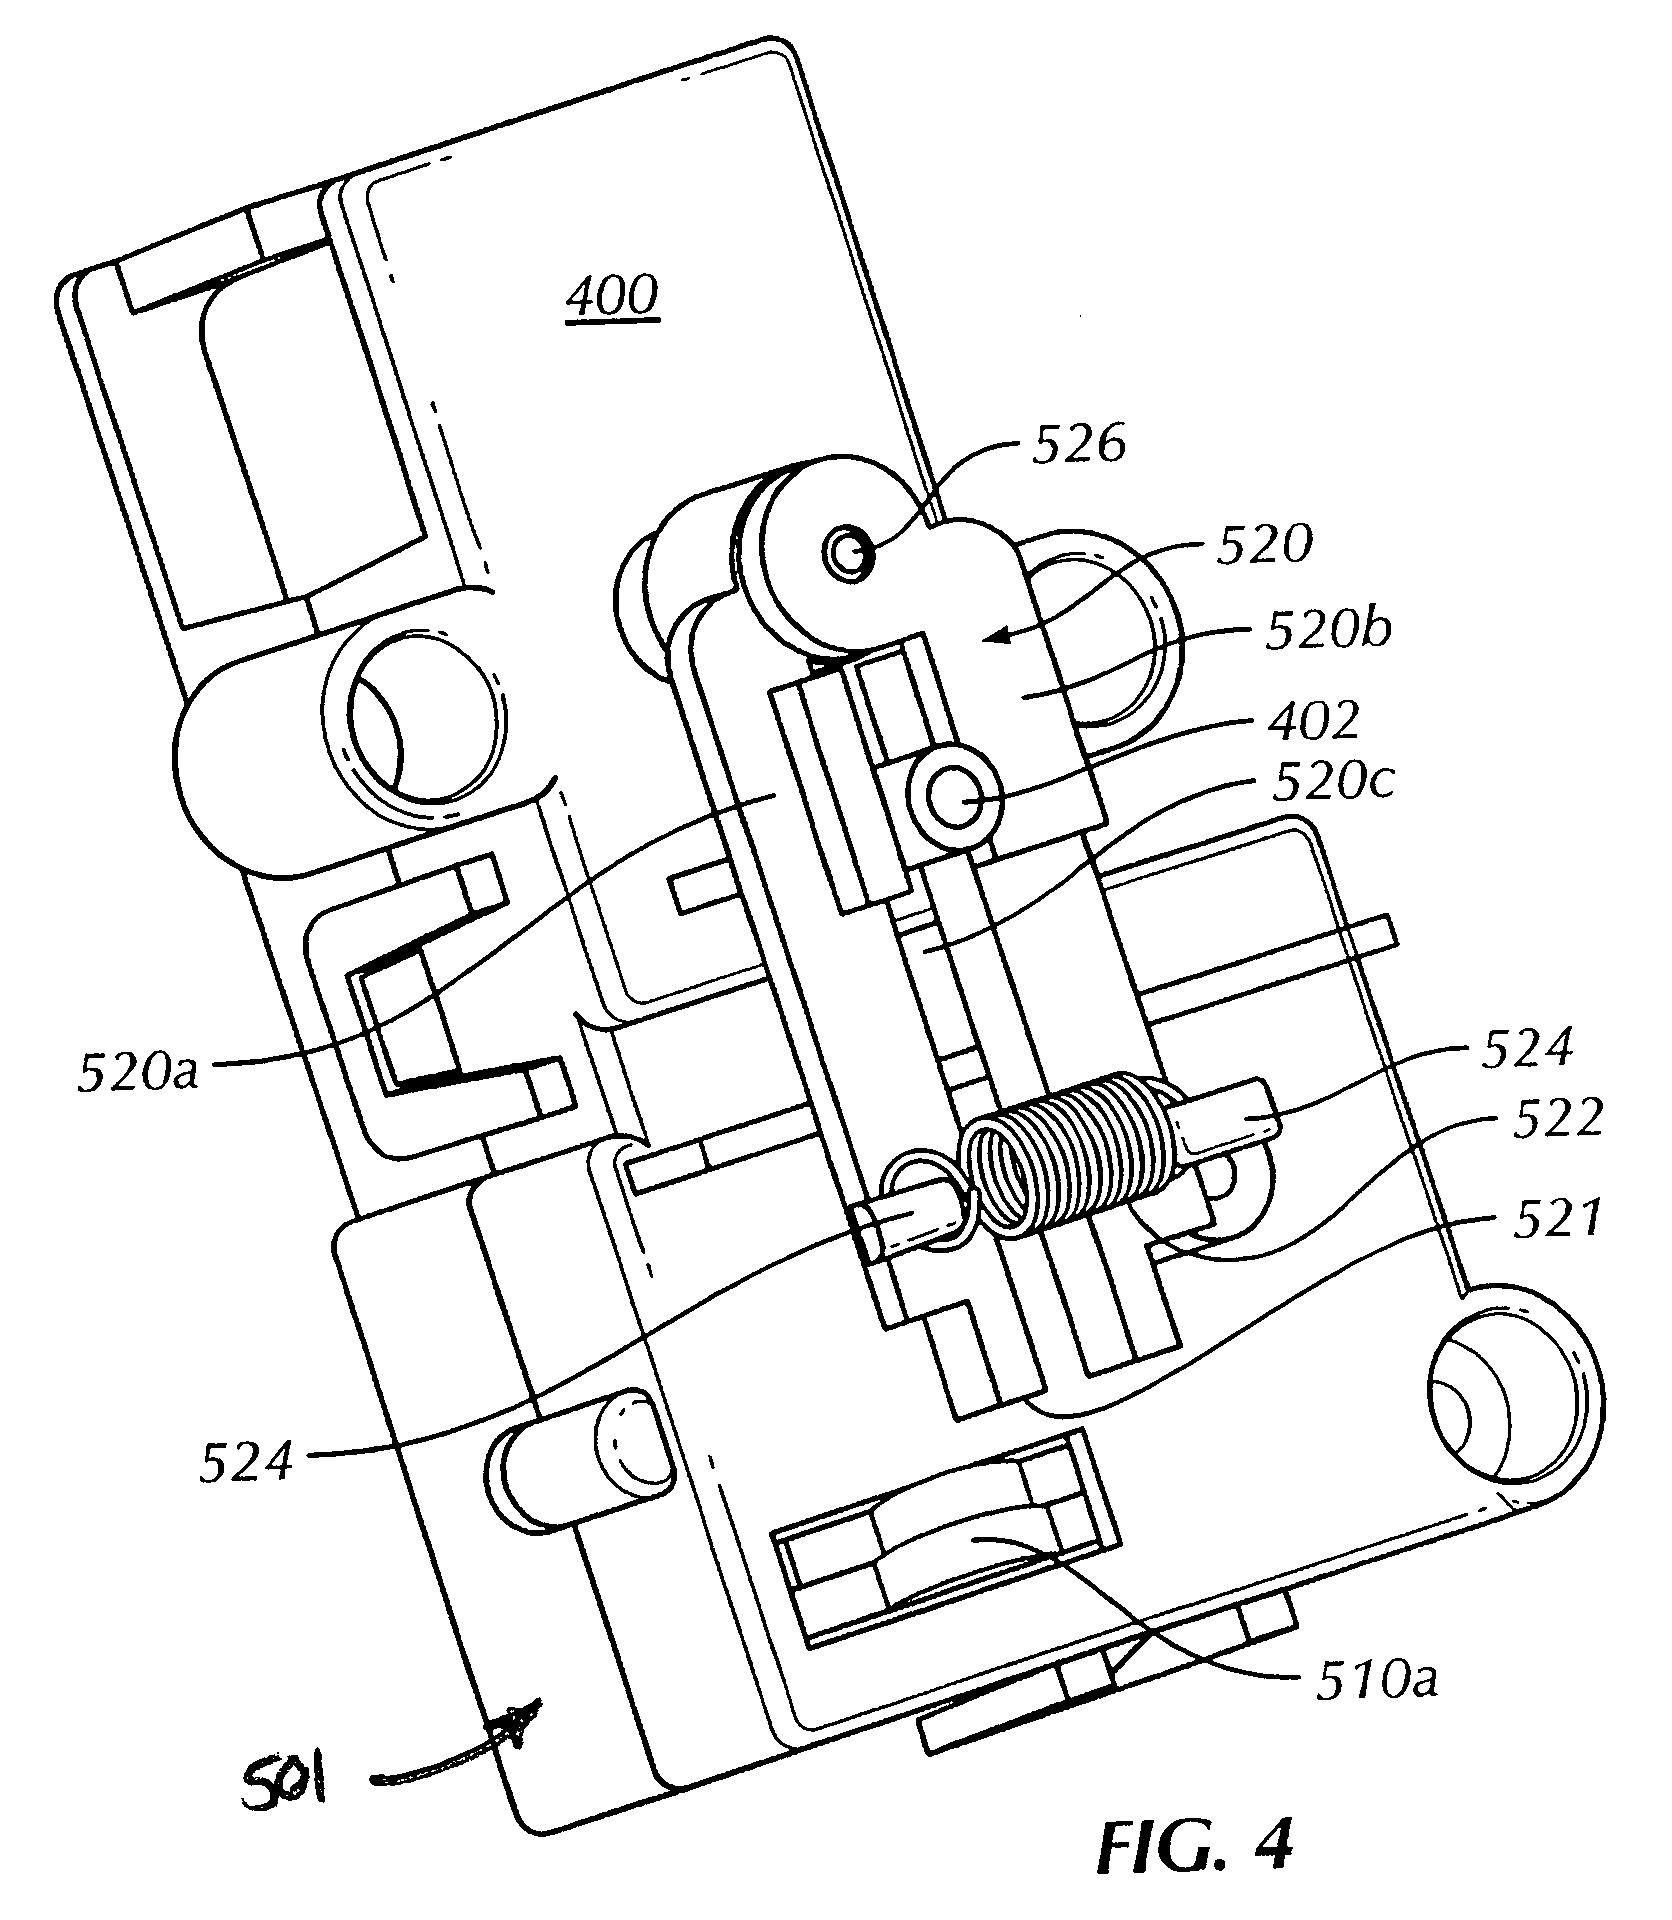 2007 isuzu nqr wire diagram auto parts diagrams